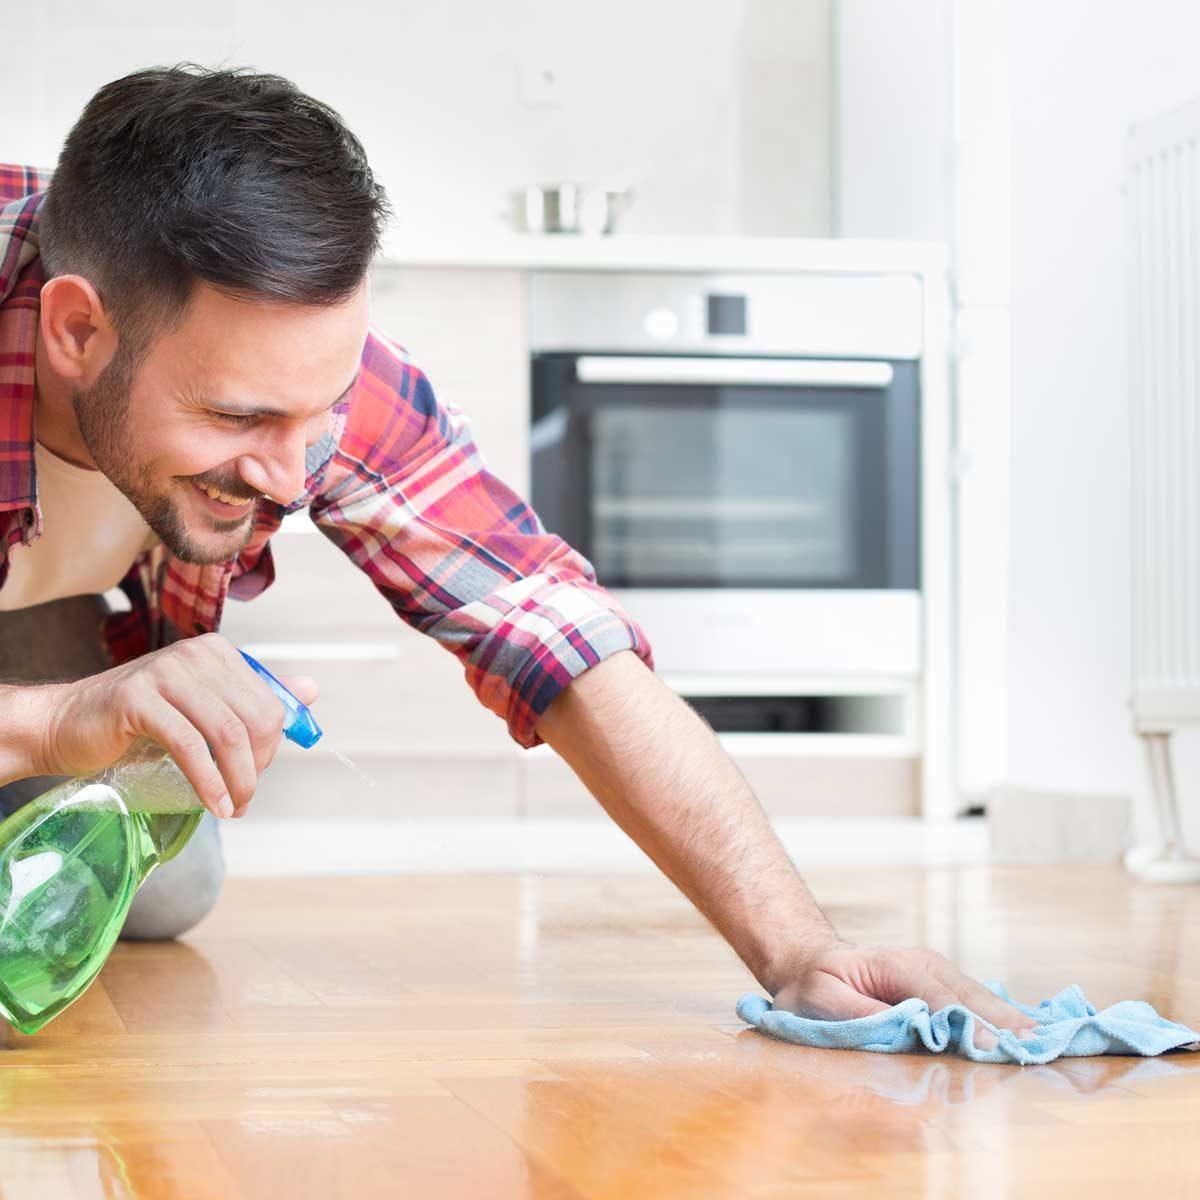 man cleaning hardwood floor